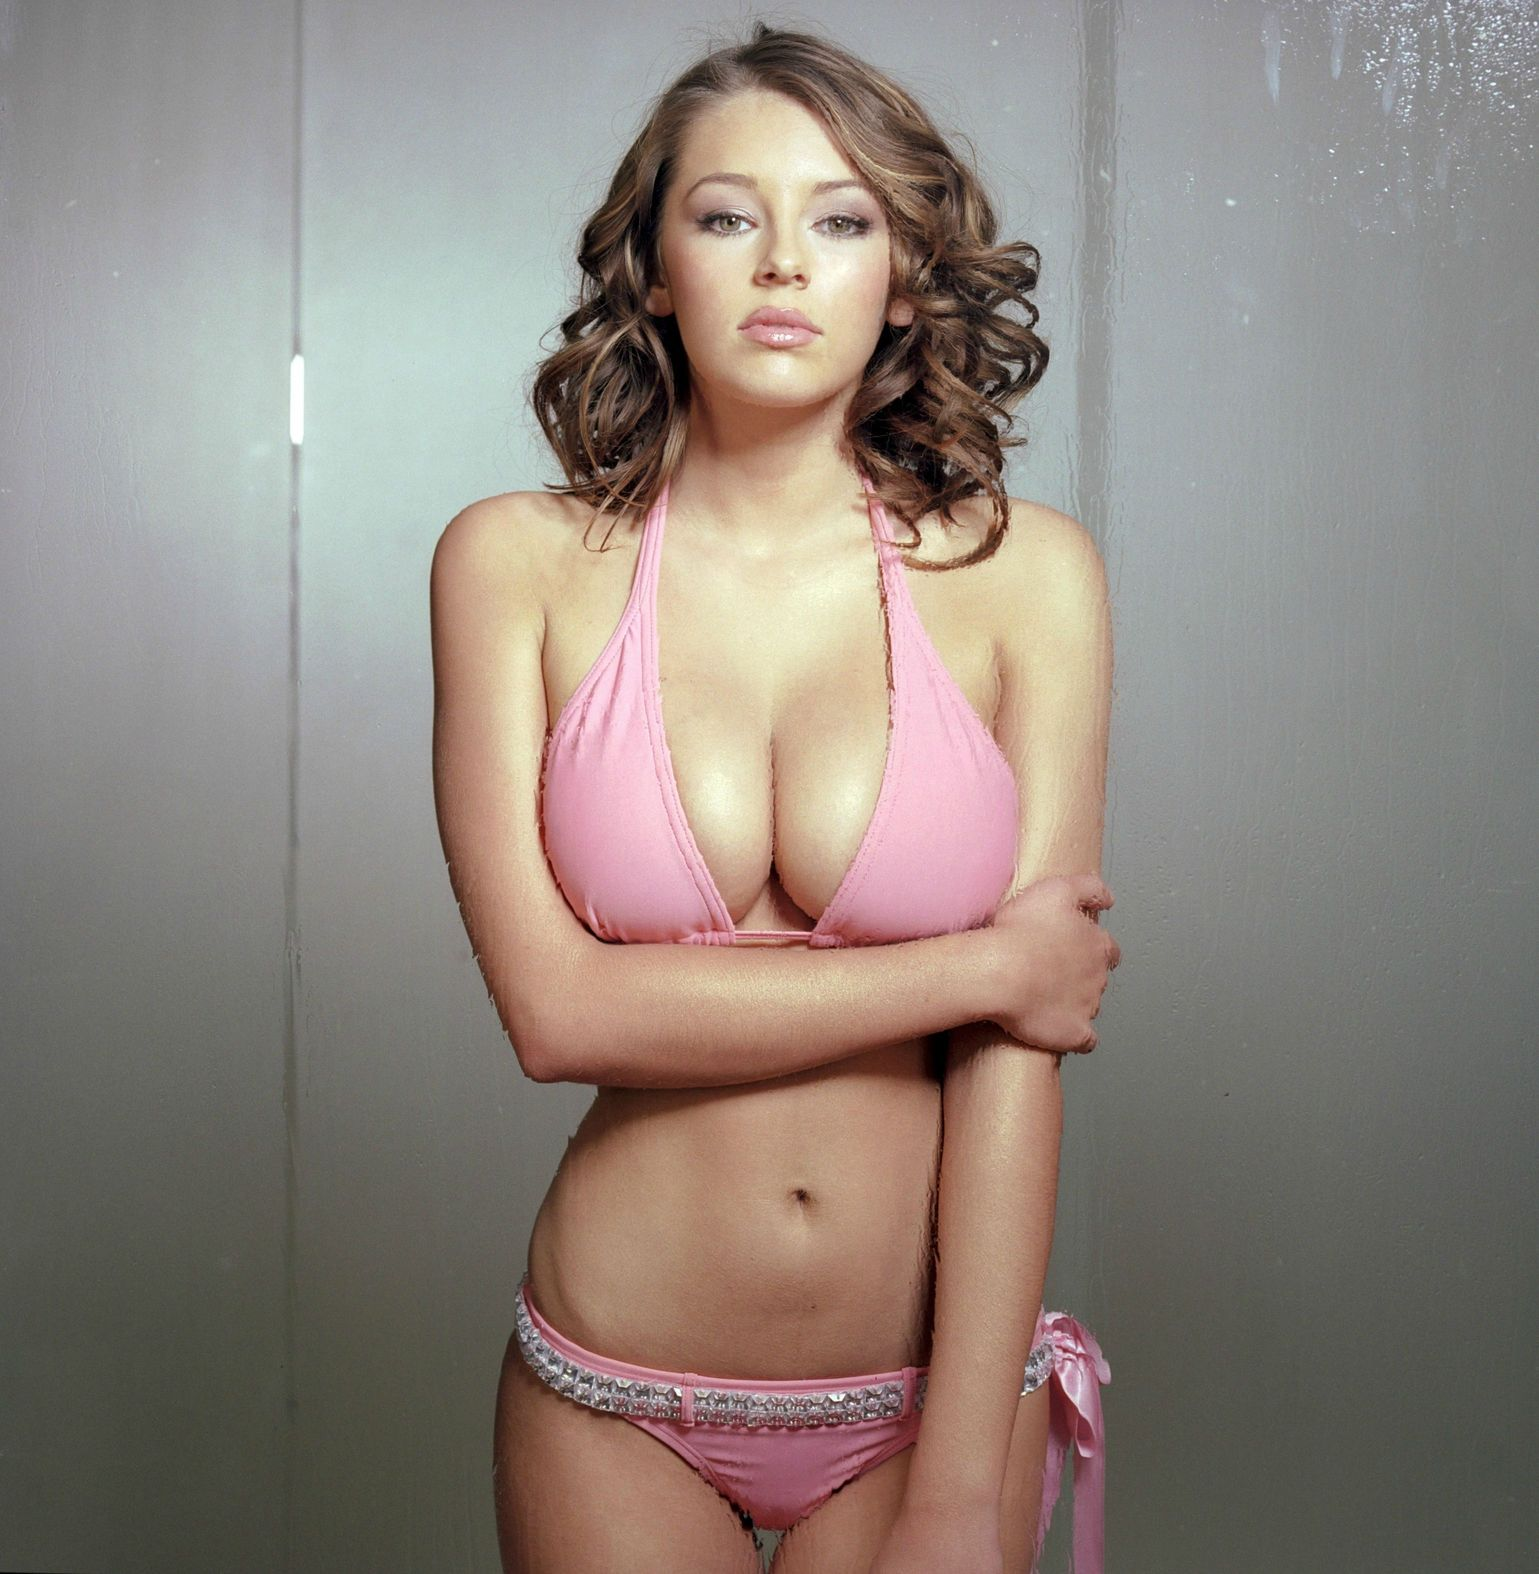 Kat dennings nudes leaked naked photo